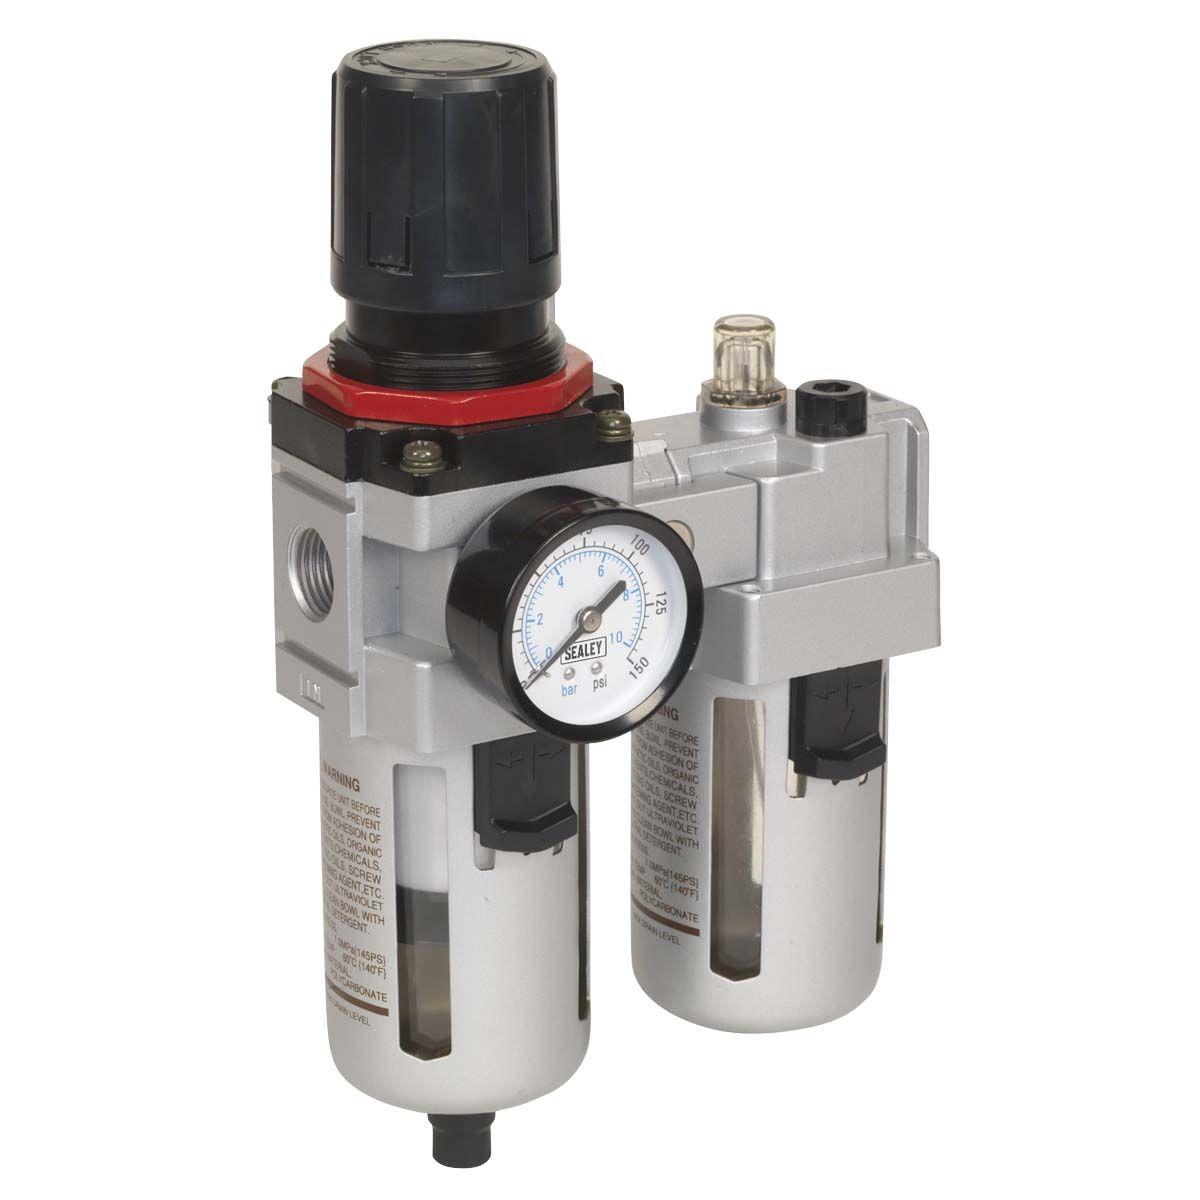 Sealey Air Filter/Regulator/Lubricator - High Flow